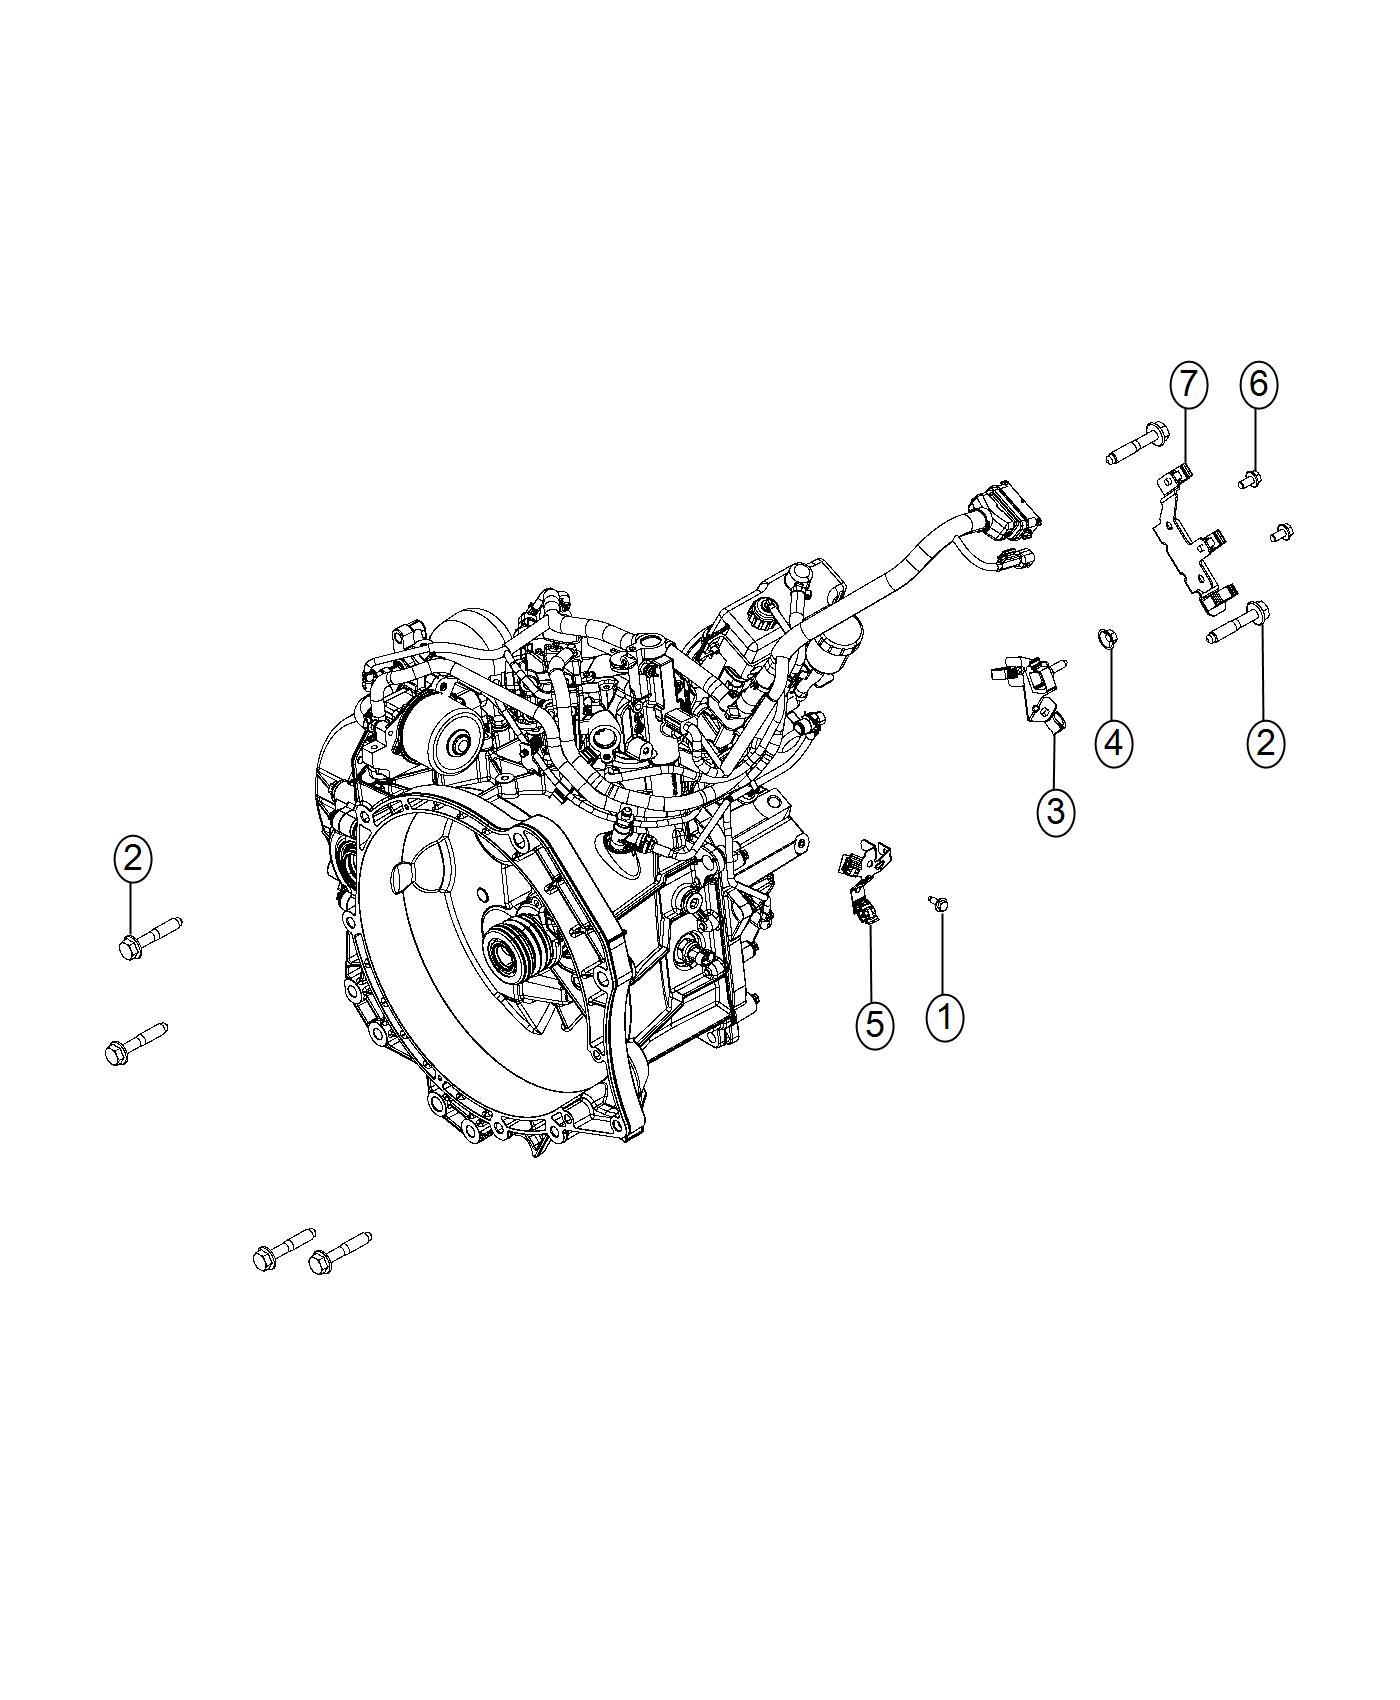 Ram Bracket Transmission Wiring Support Trim